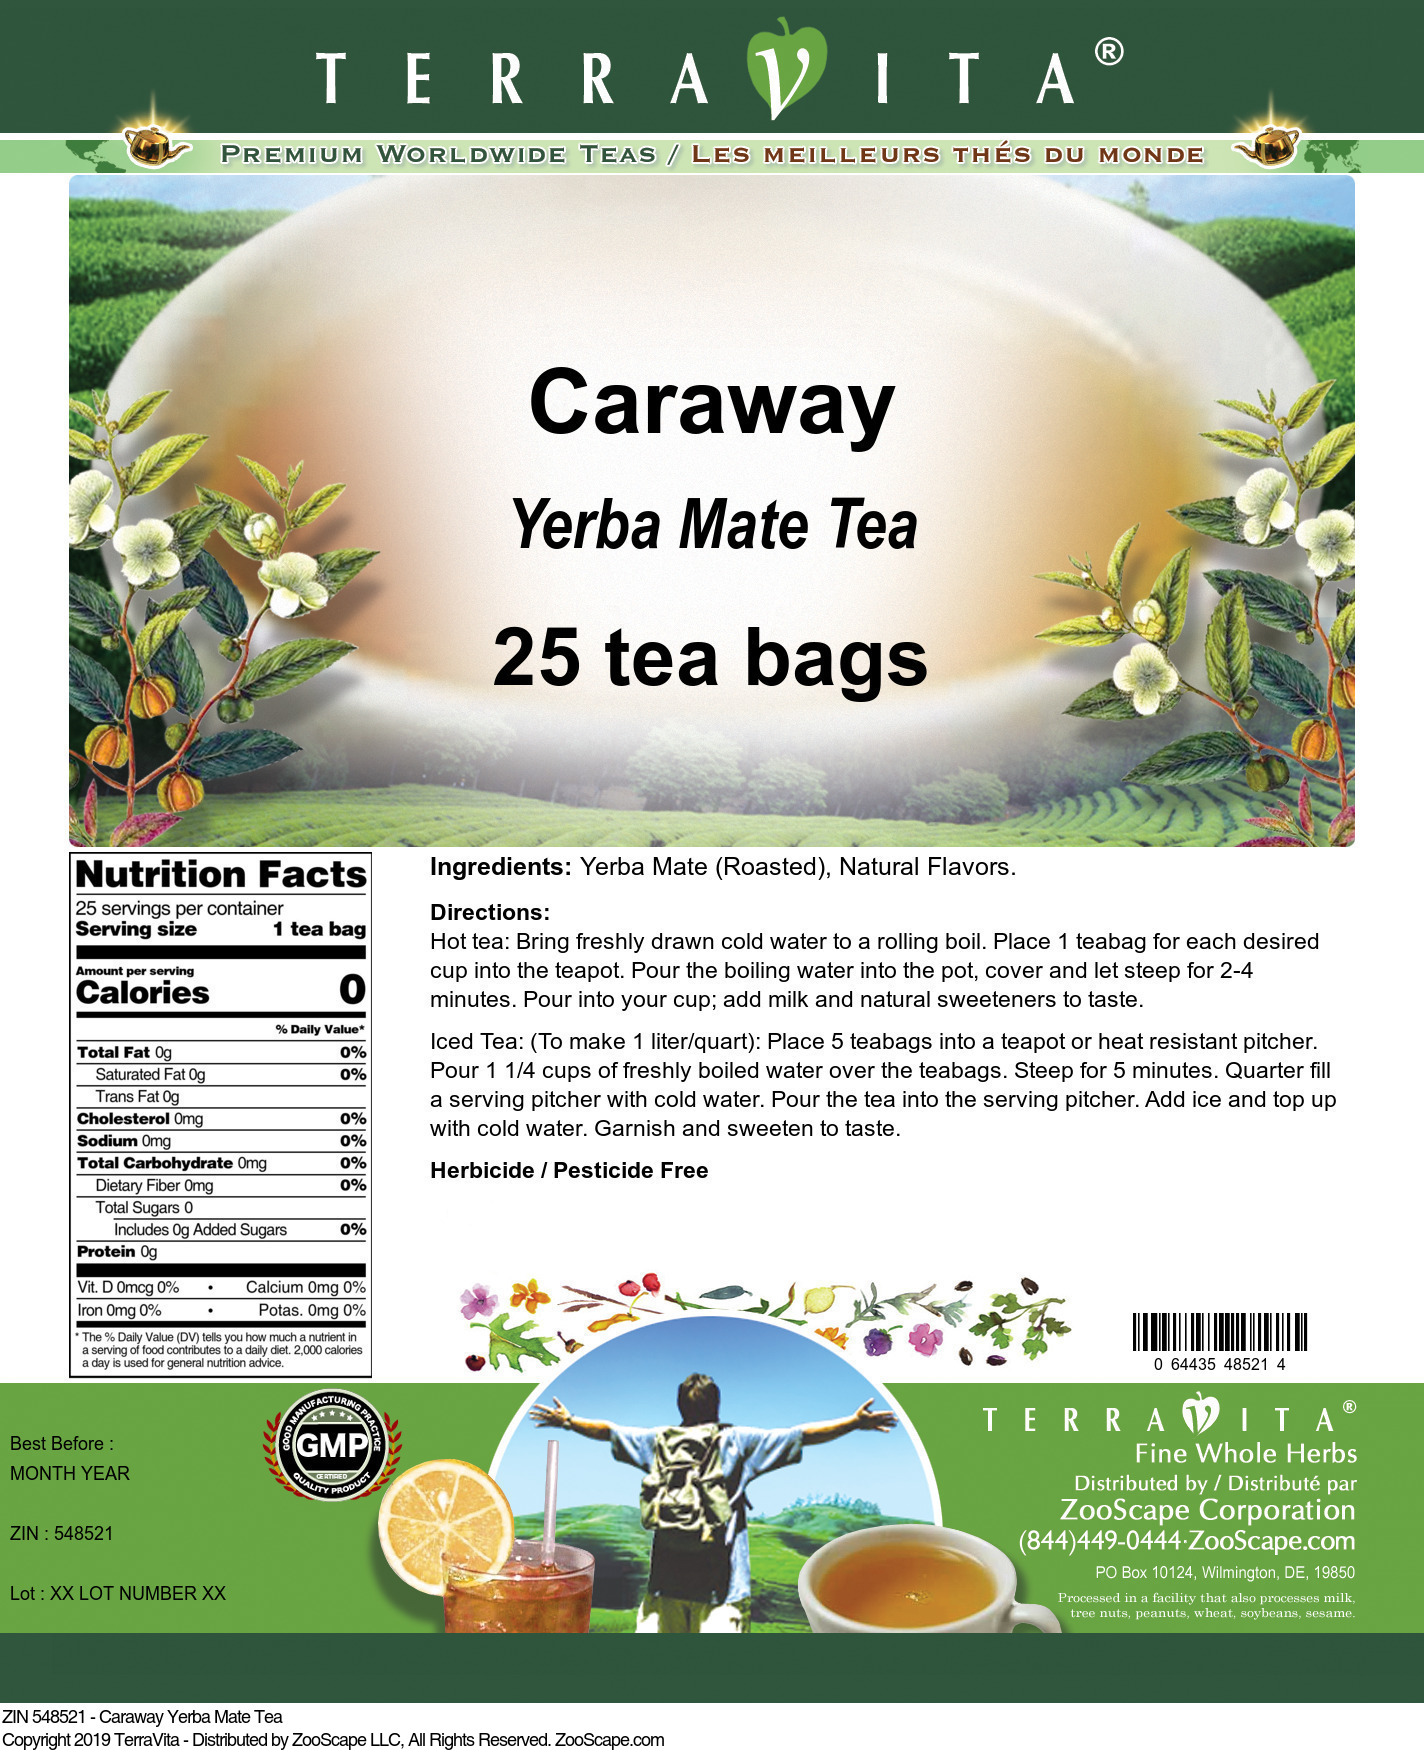 Caraway Yerba Mate Tea